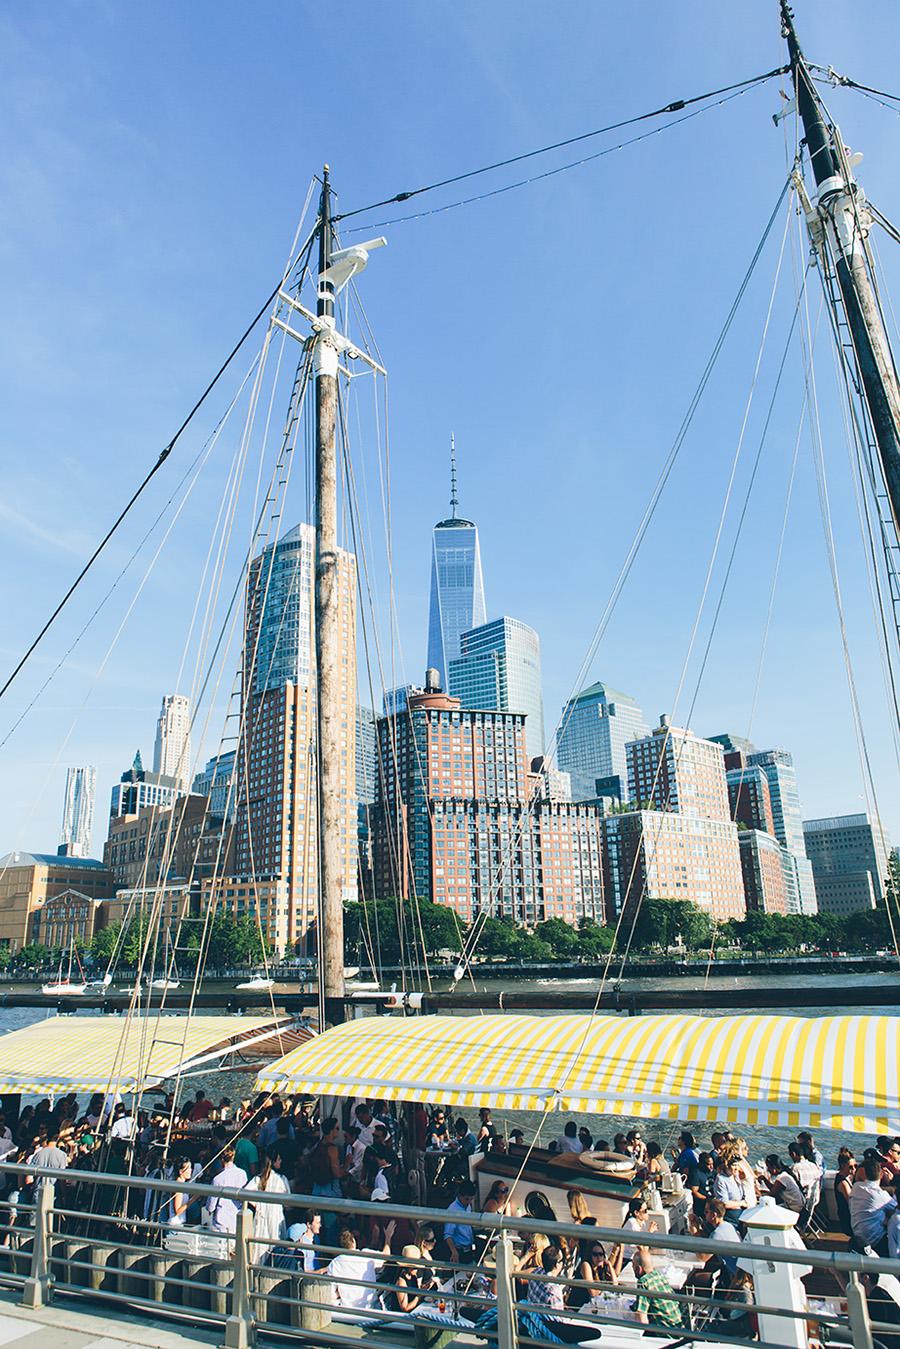 NEW-YORK-CITY-WEDDING-PHOTOGRAPHER-WEST-VILLAGE-GREENWICH-HOTEL-GRAND-BANKS-PIER-0064.jpg